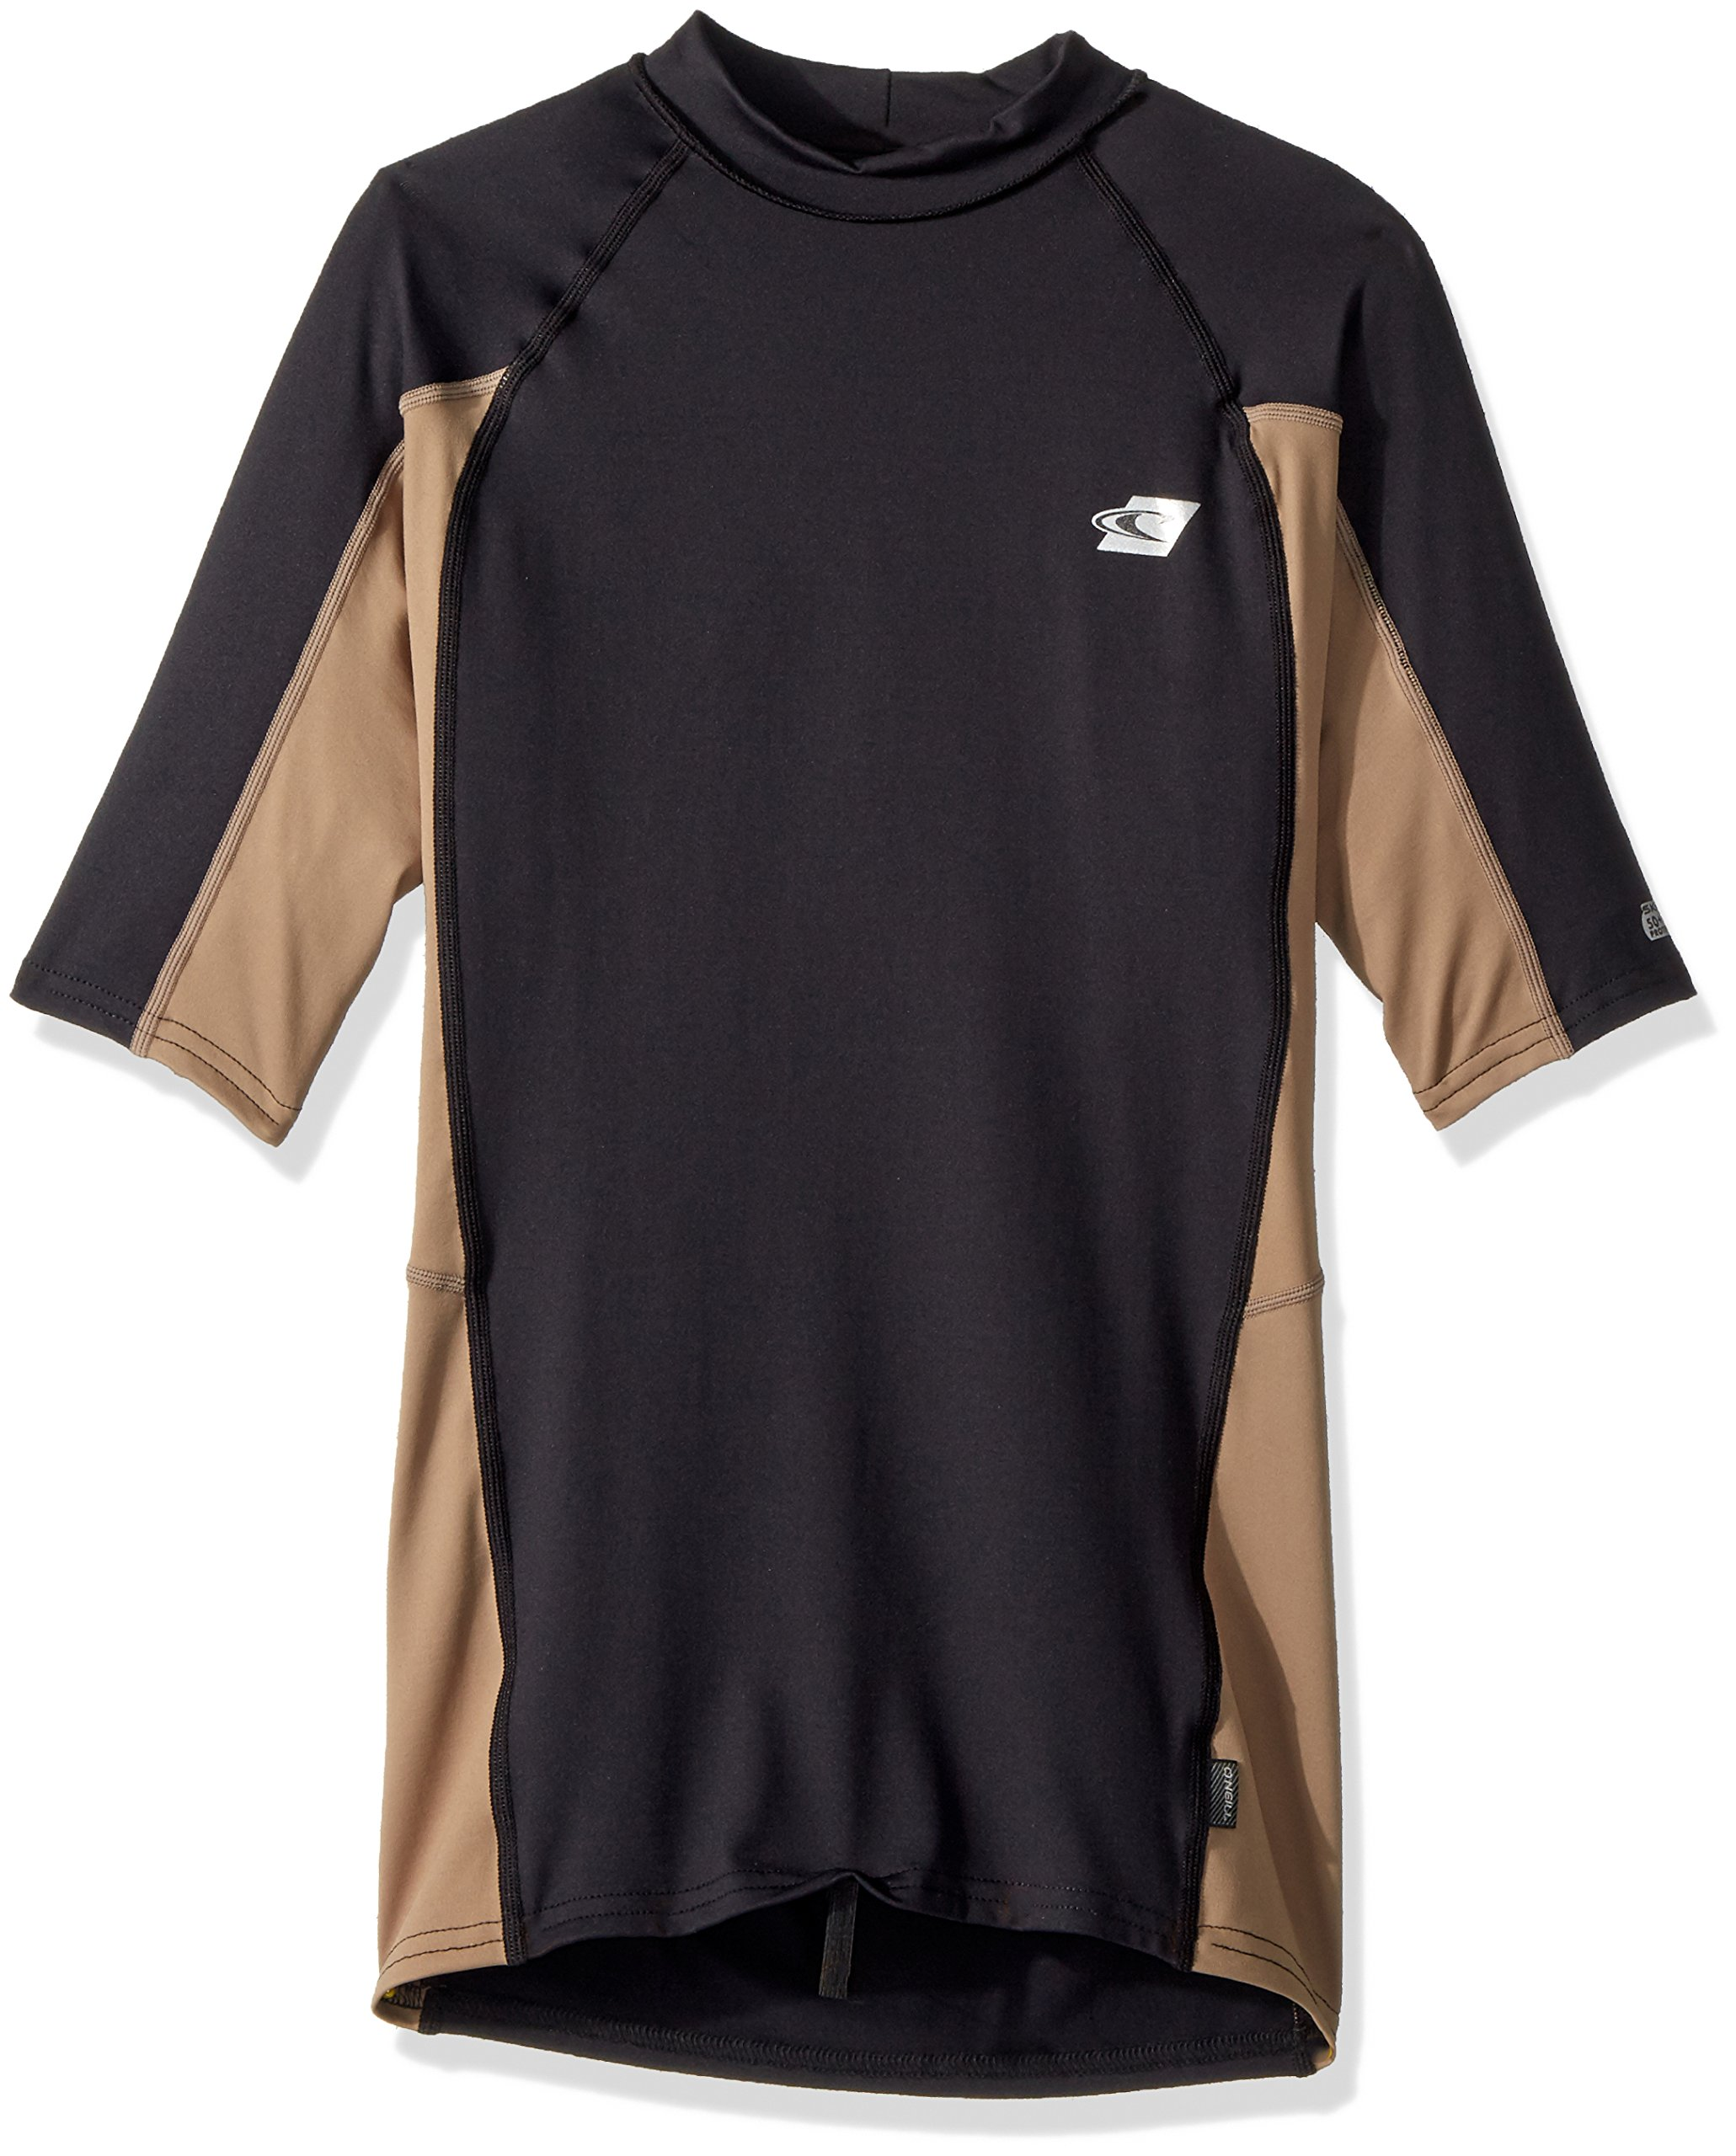 O'NEILL Men's Premium Skins UPF 50+ Short Sleeve Rash Guard, Black/Khaki, X-Large by O'NEILL